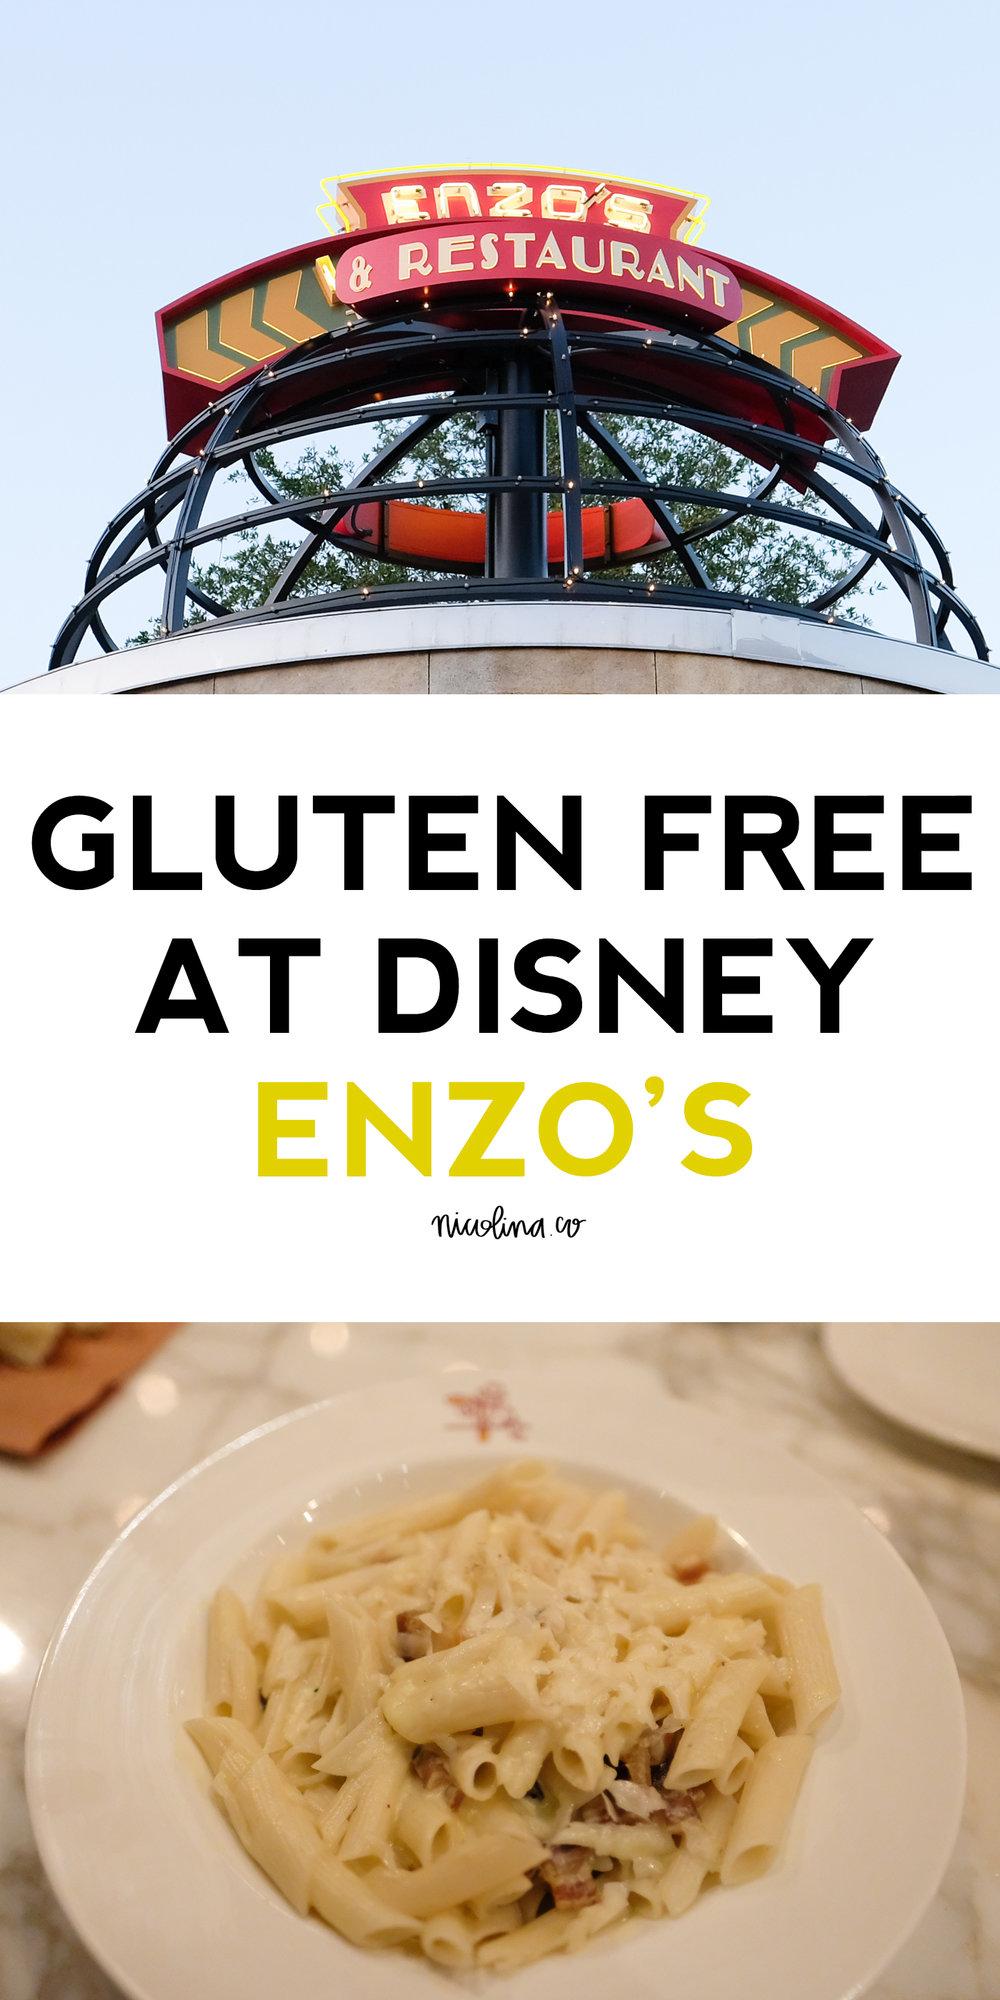 GlutenFree_enzos.jpg